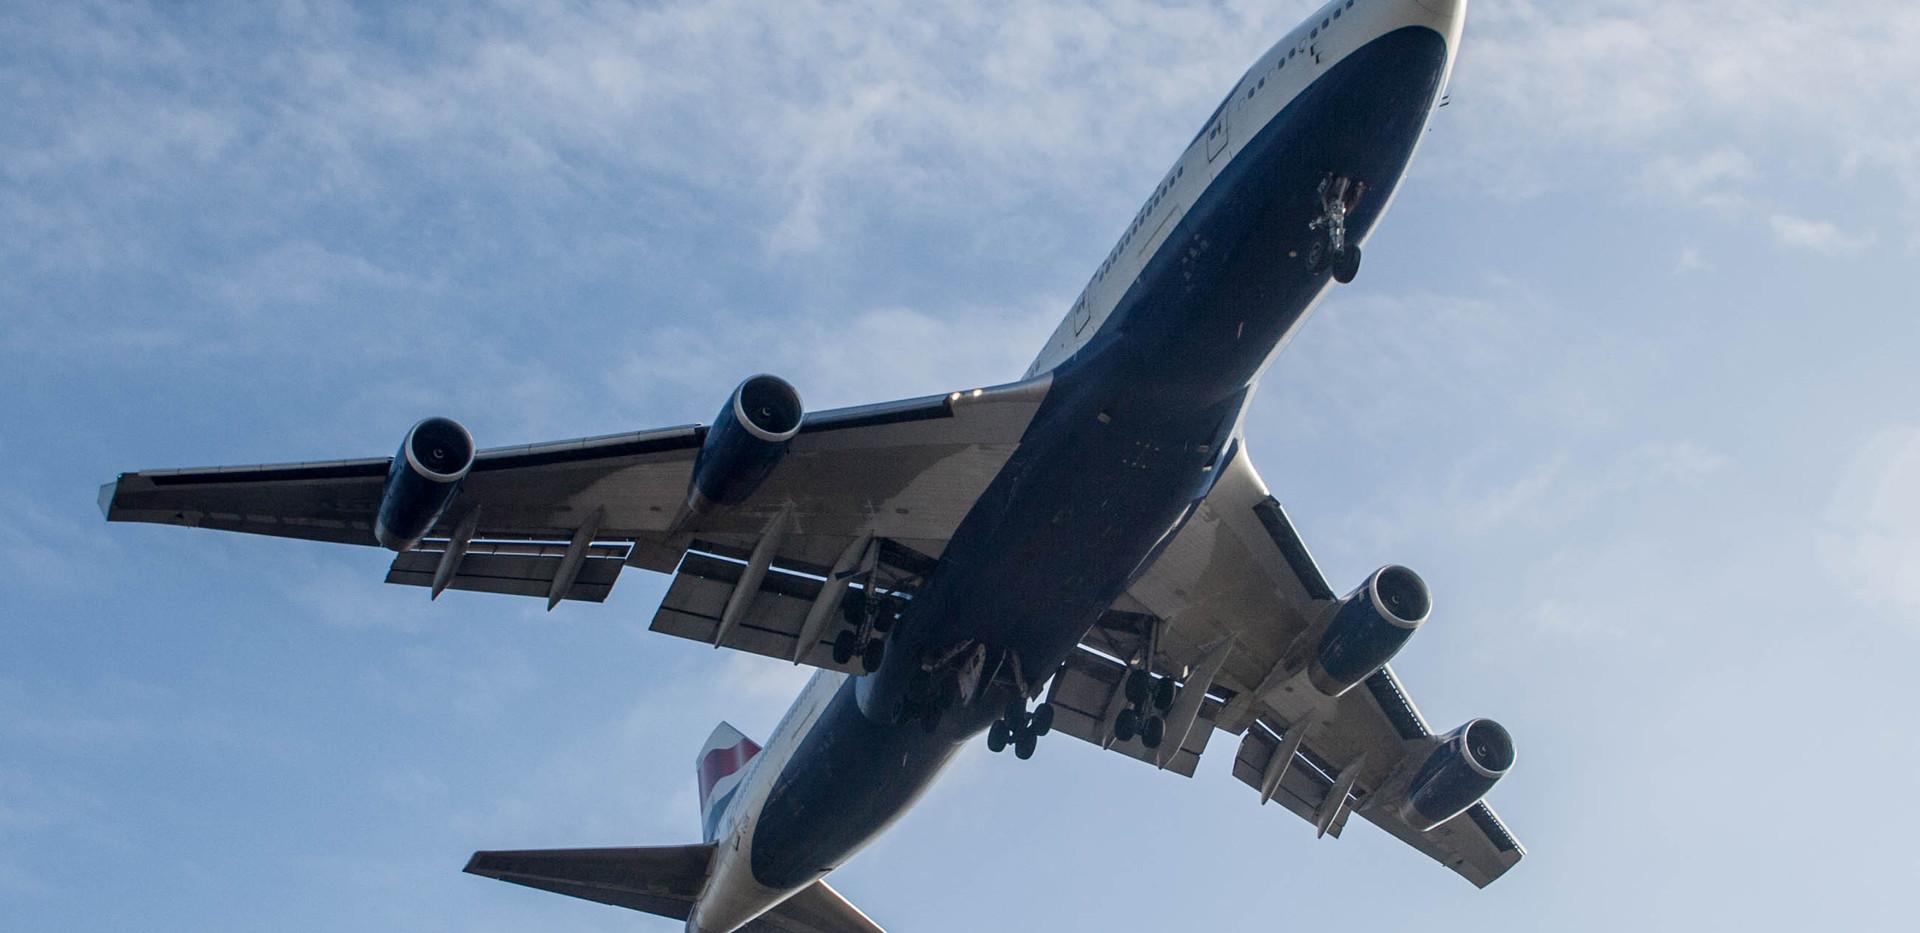 boeing-747---msn-28848---g-civn-1-of-1_3